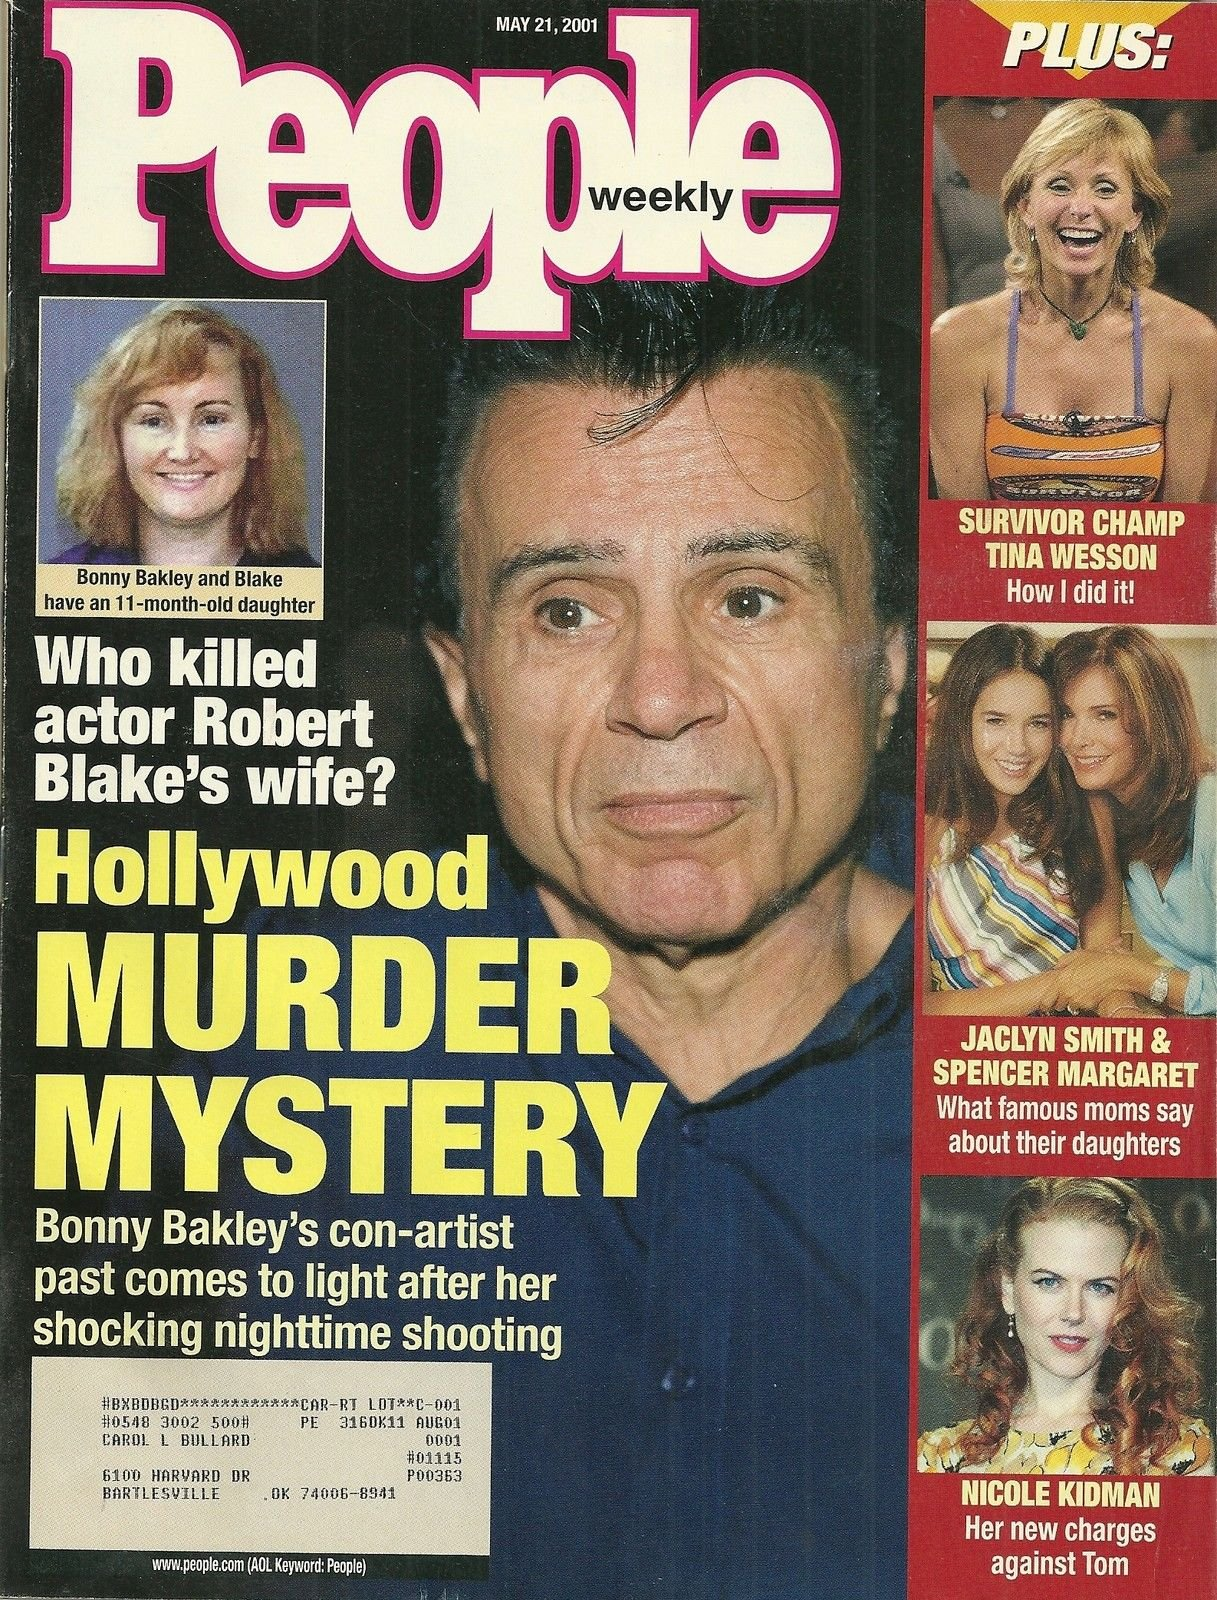 Robert Blake and Bonny Bakley, Nicole Kidman, Jaclyn Smith